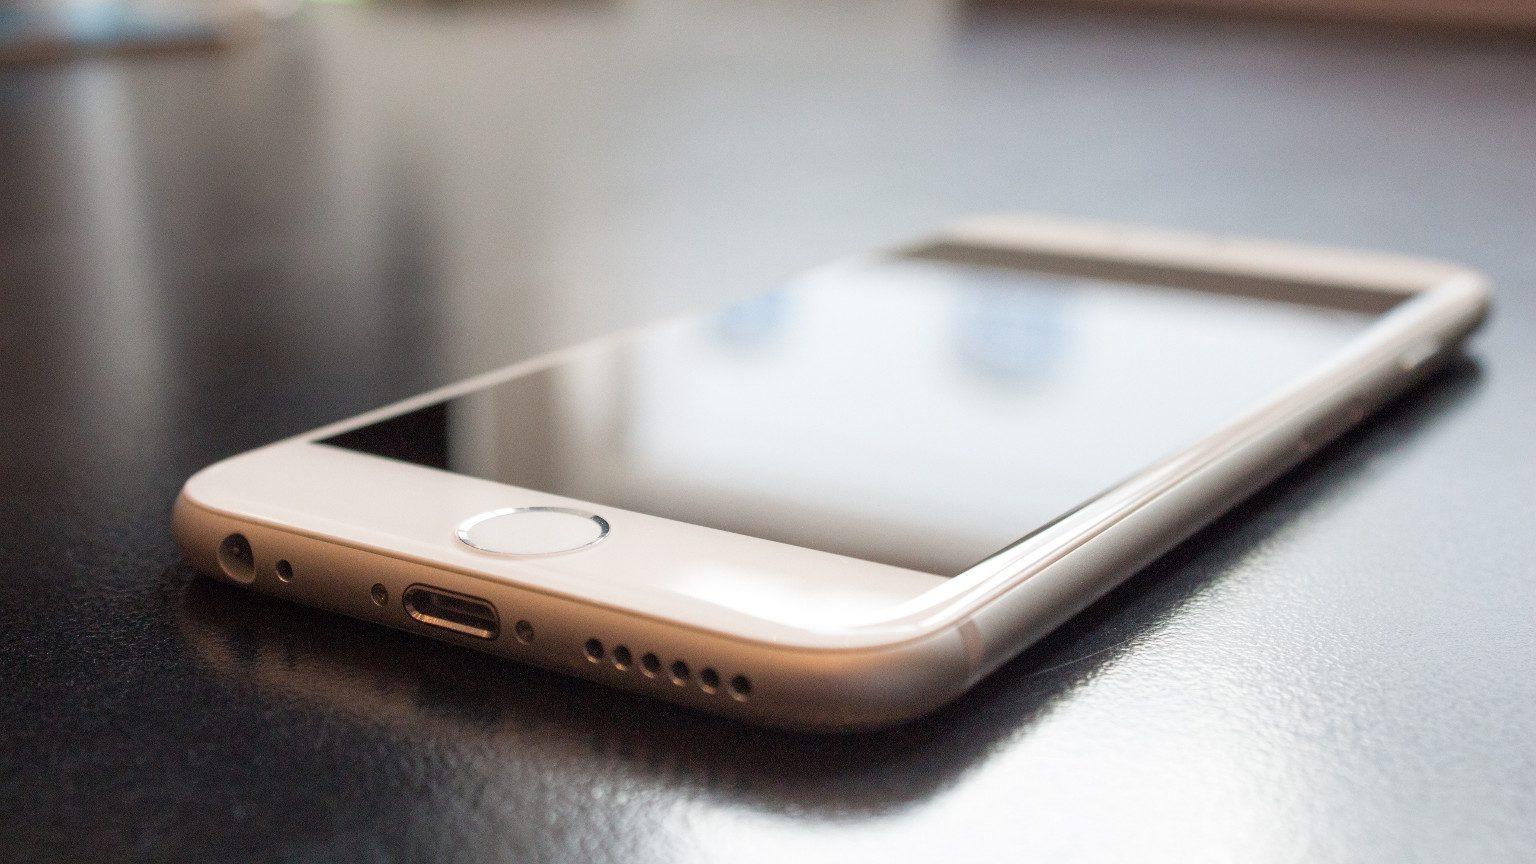 Apple iPhone 6 on desk